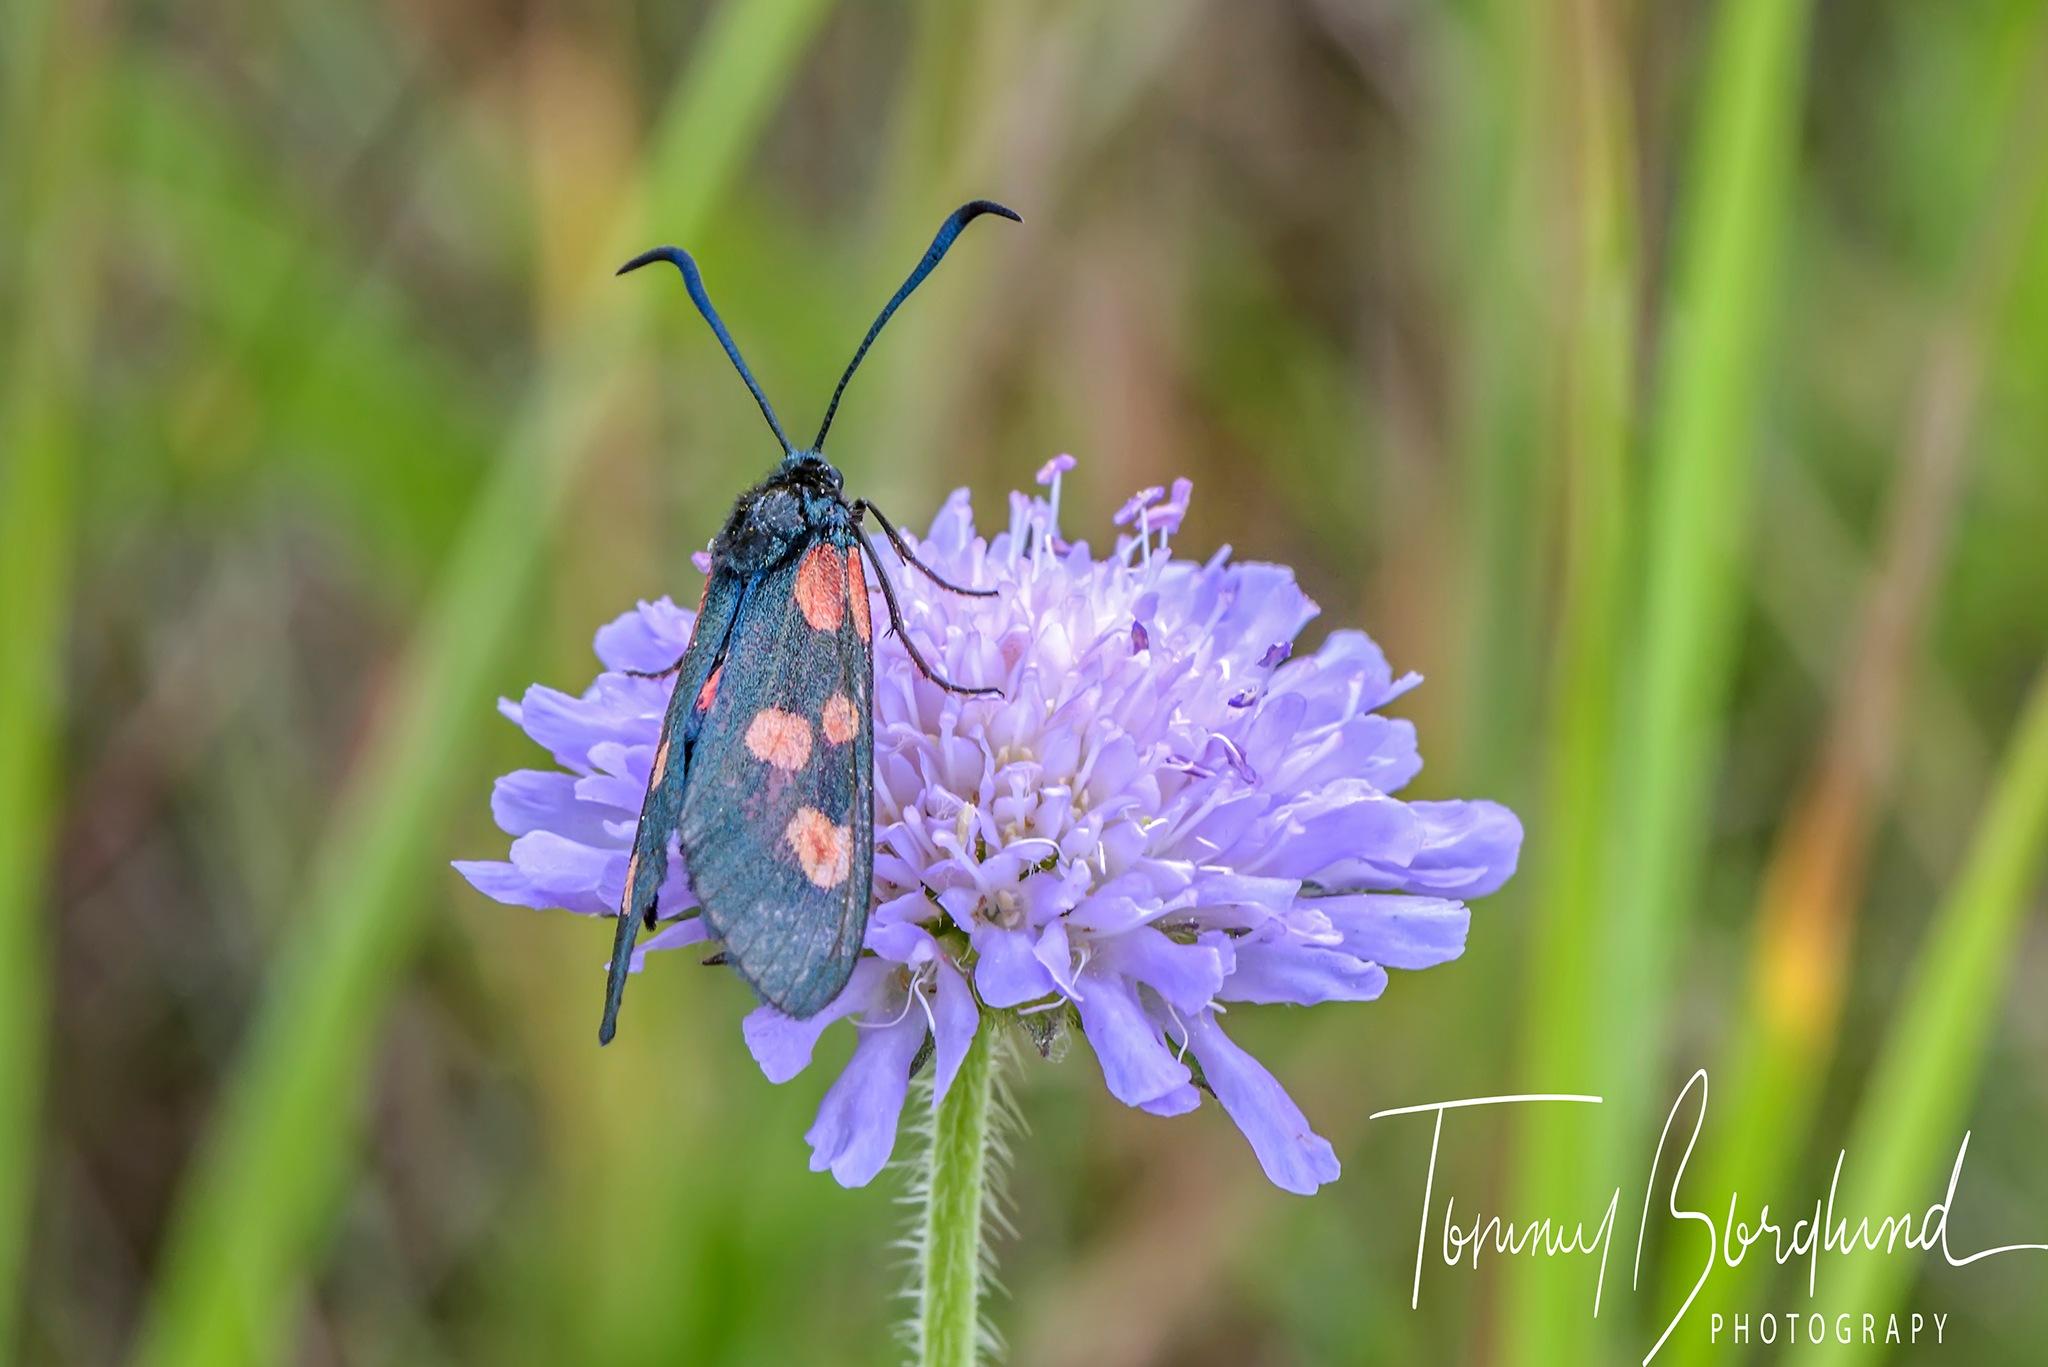 Narrow-bordered five-spot burnet, (Zygaena lonicerae) by TommyBorglund